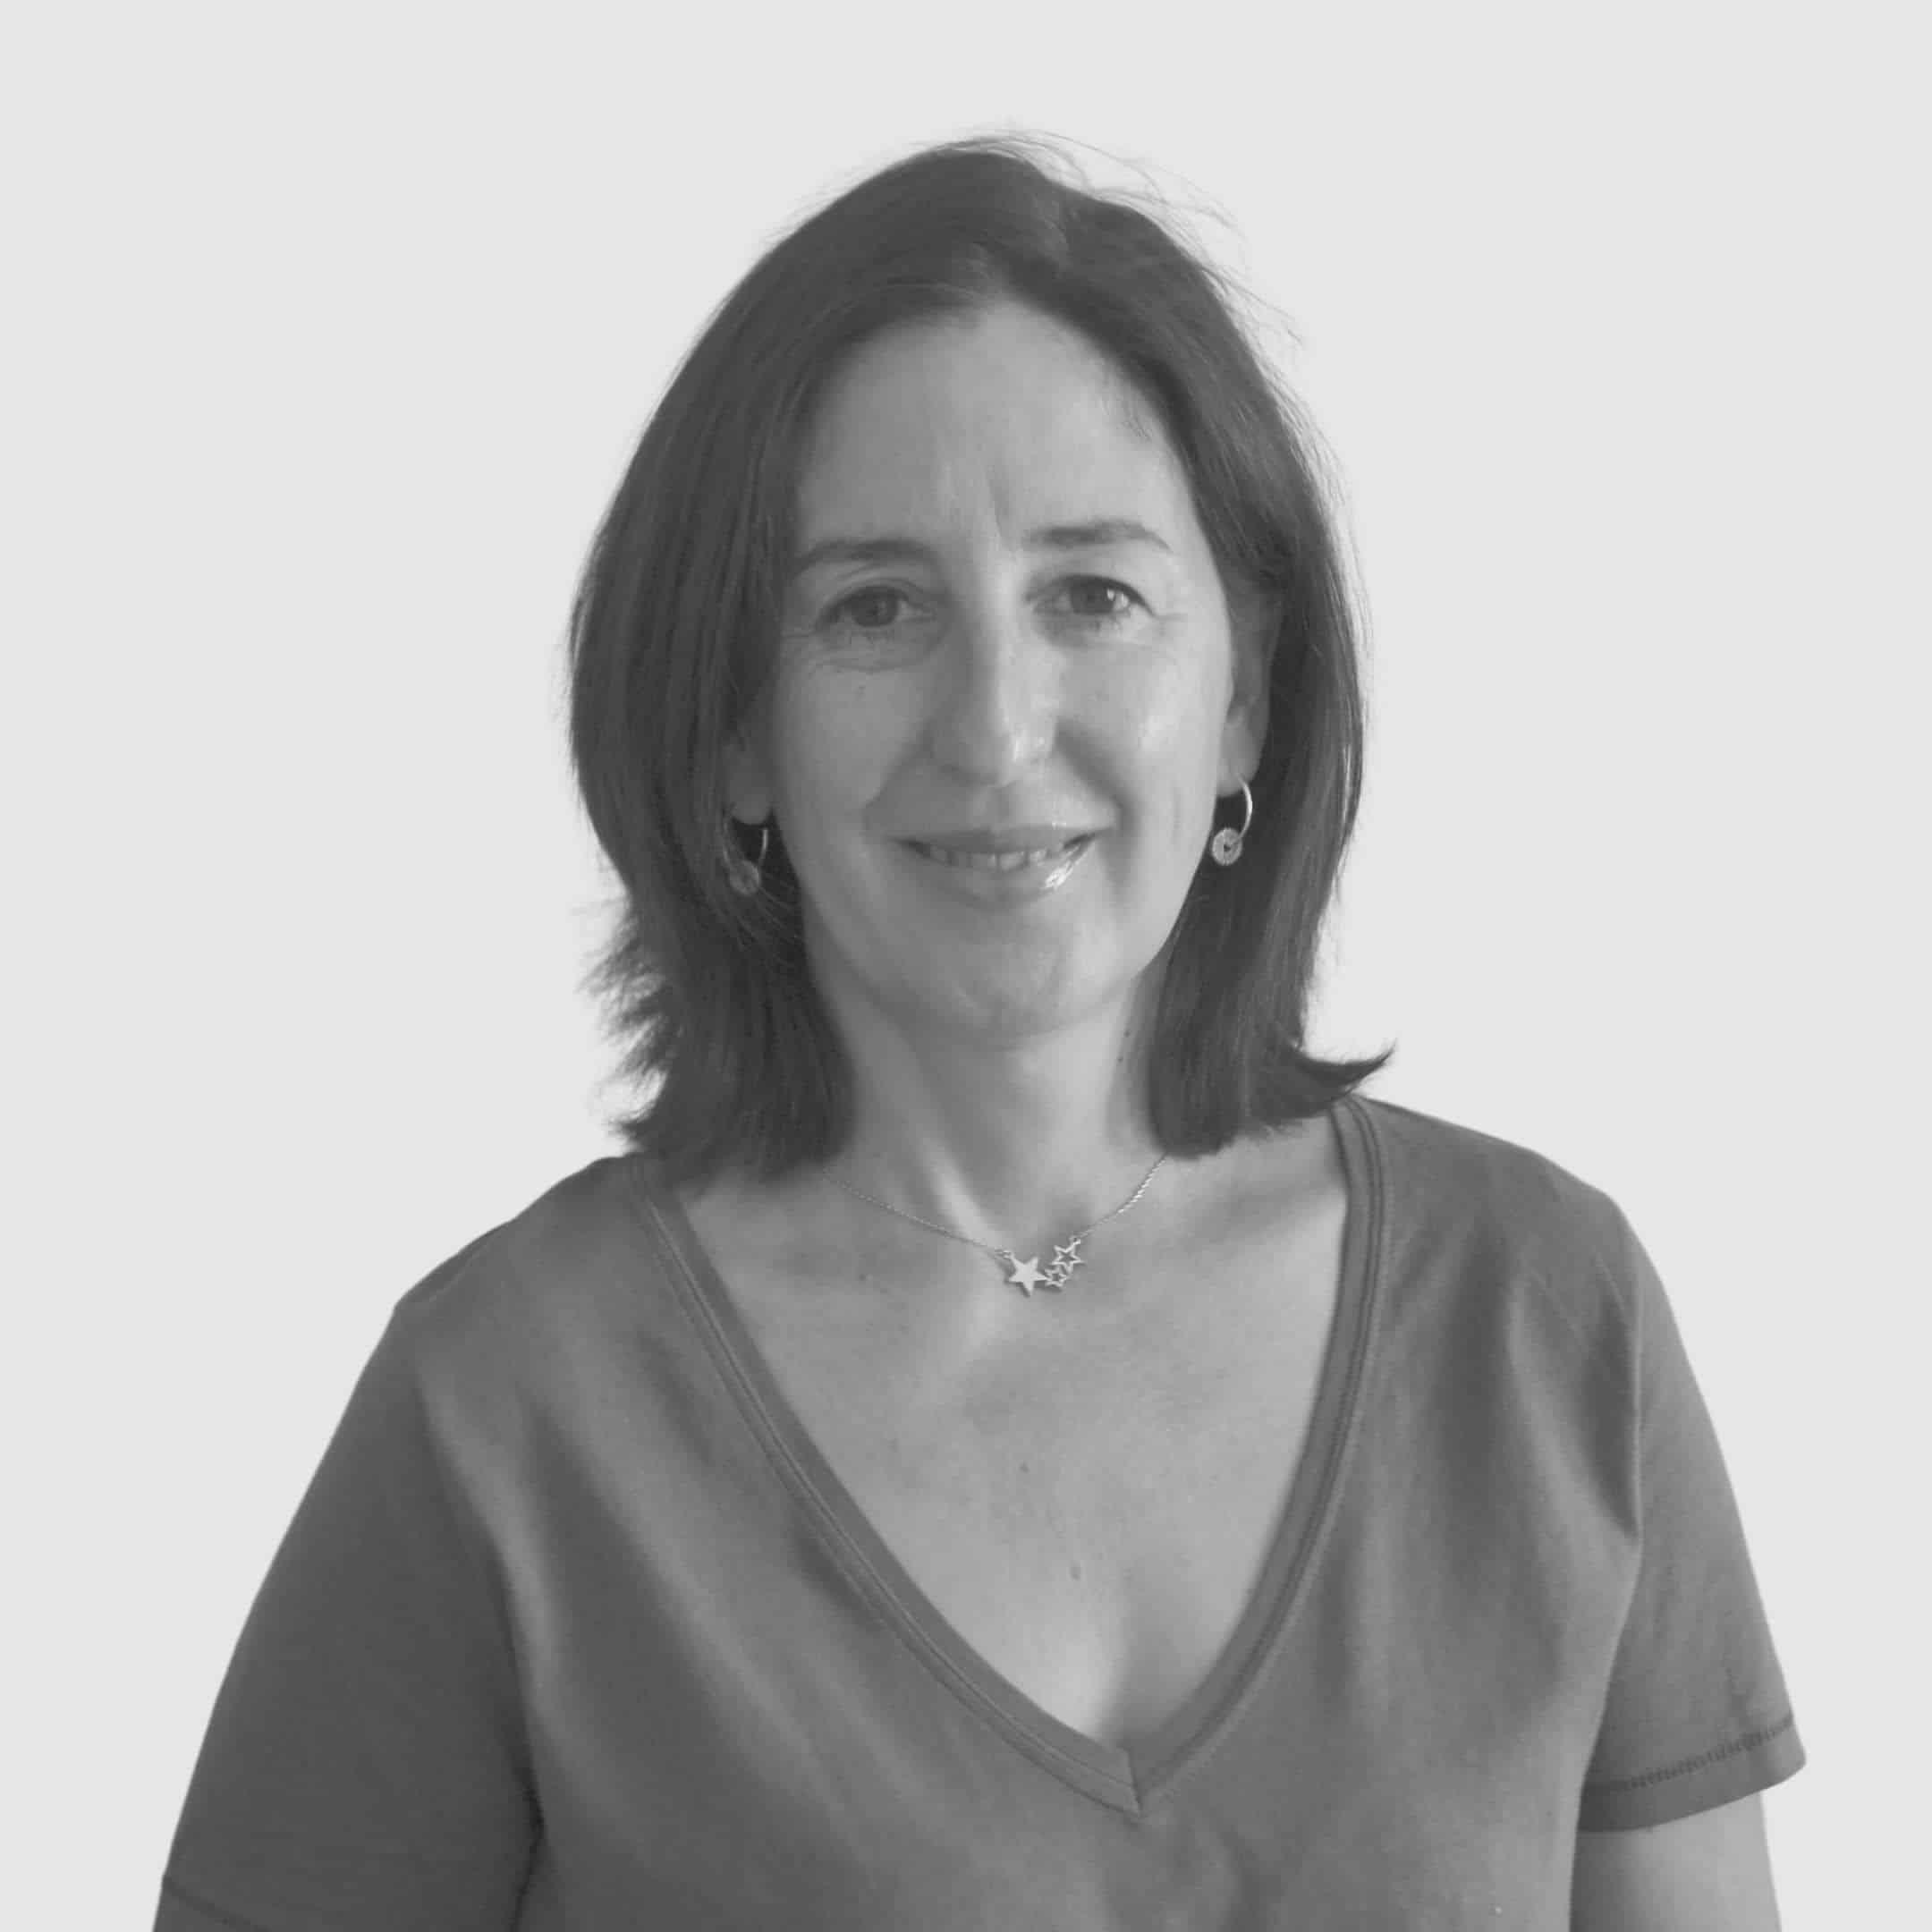 Paula Areso fisioterapeuta